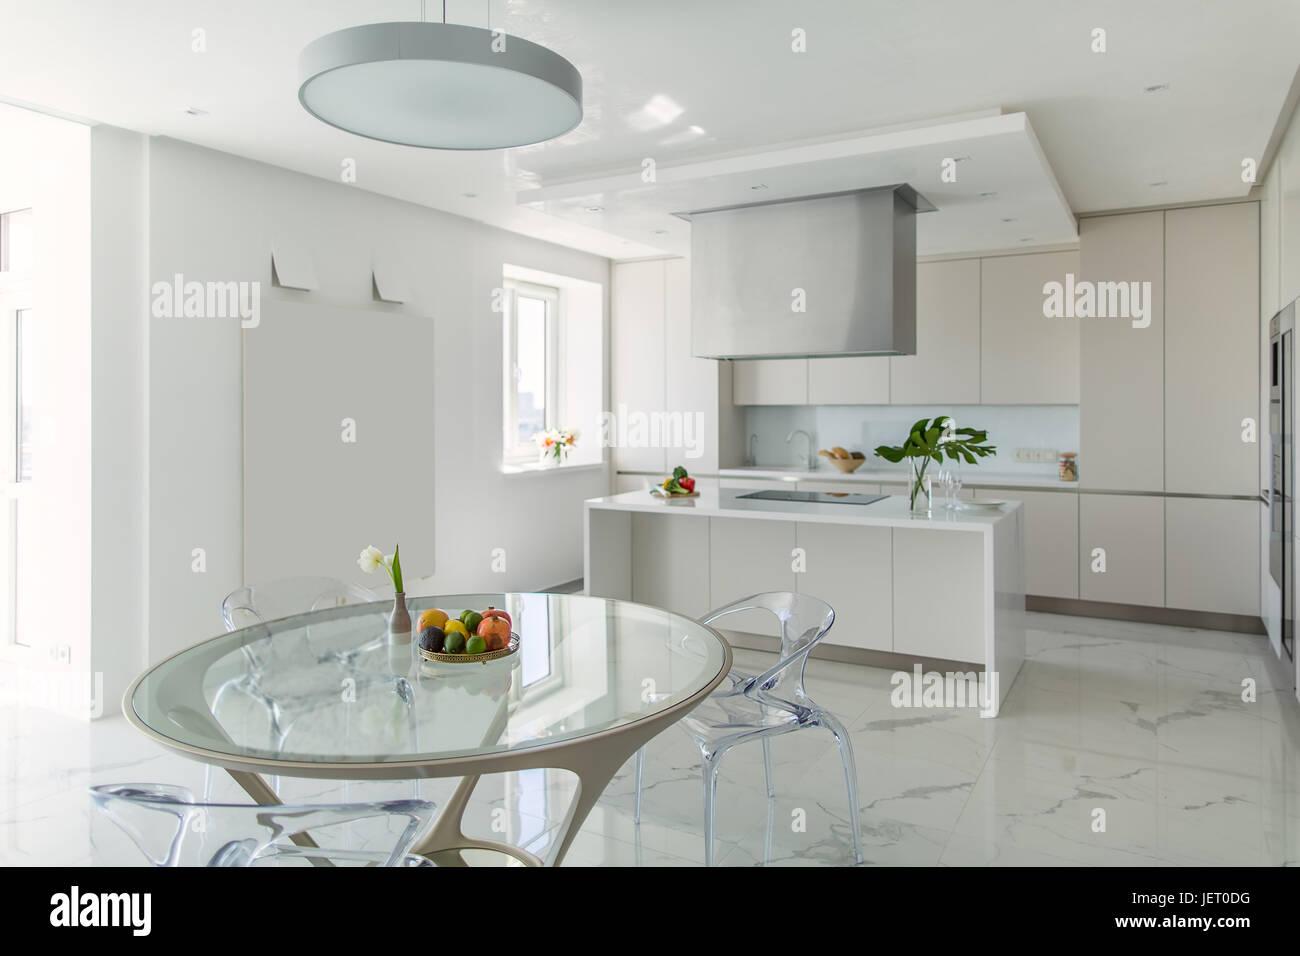 Piastrelle per cucina bianca cucina moderna bianca piastrelle